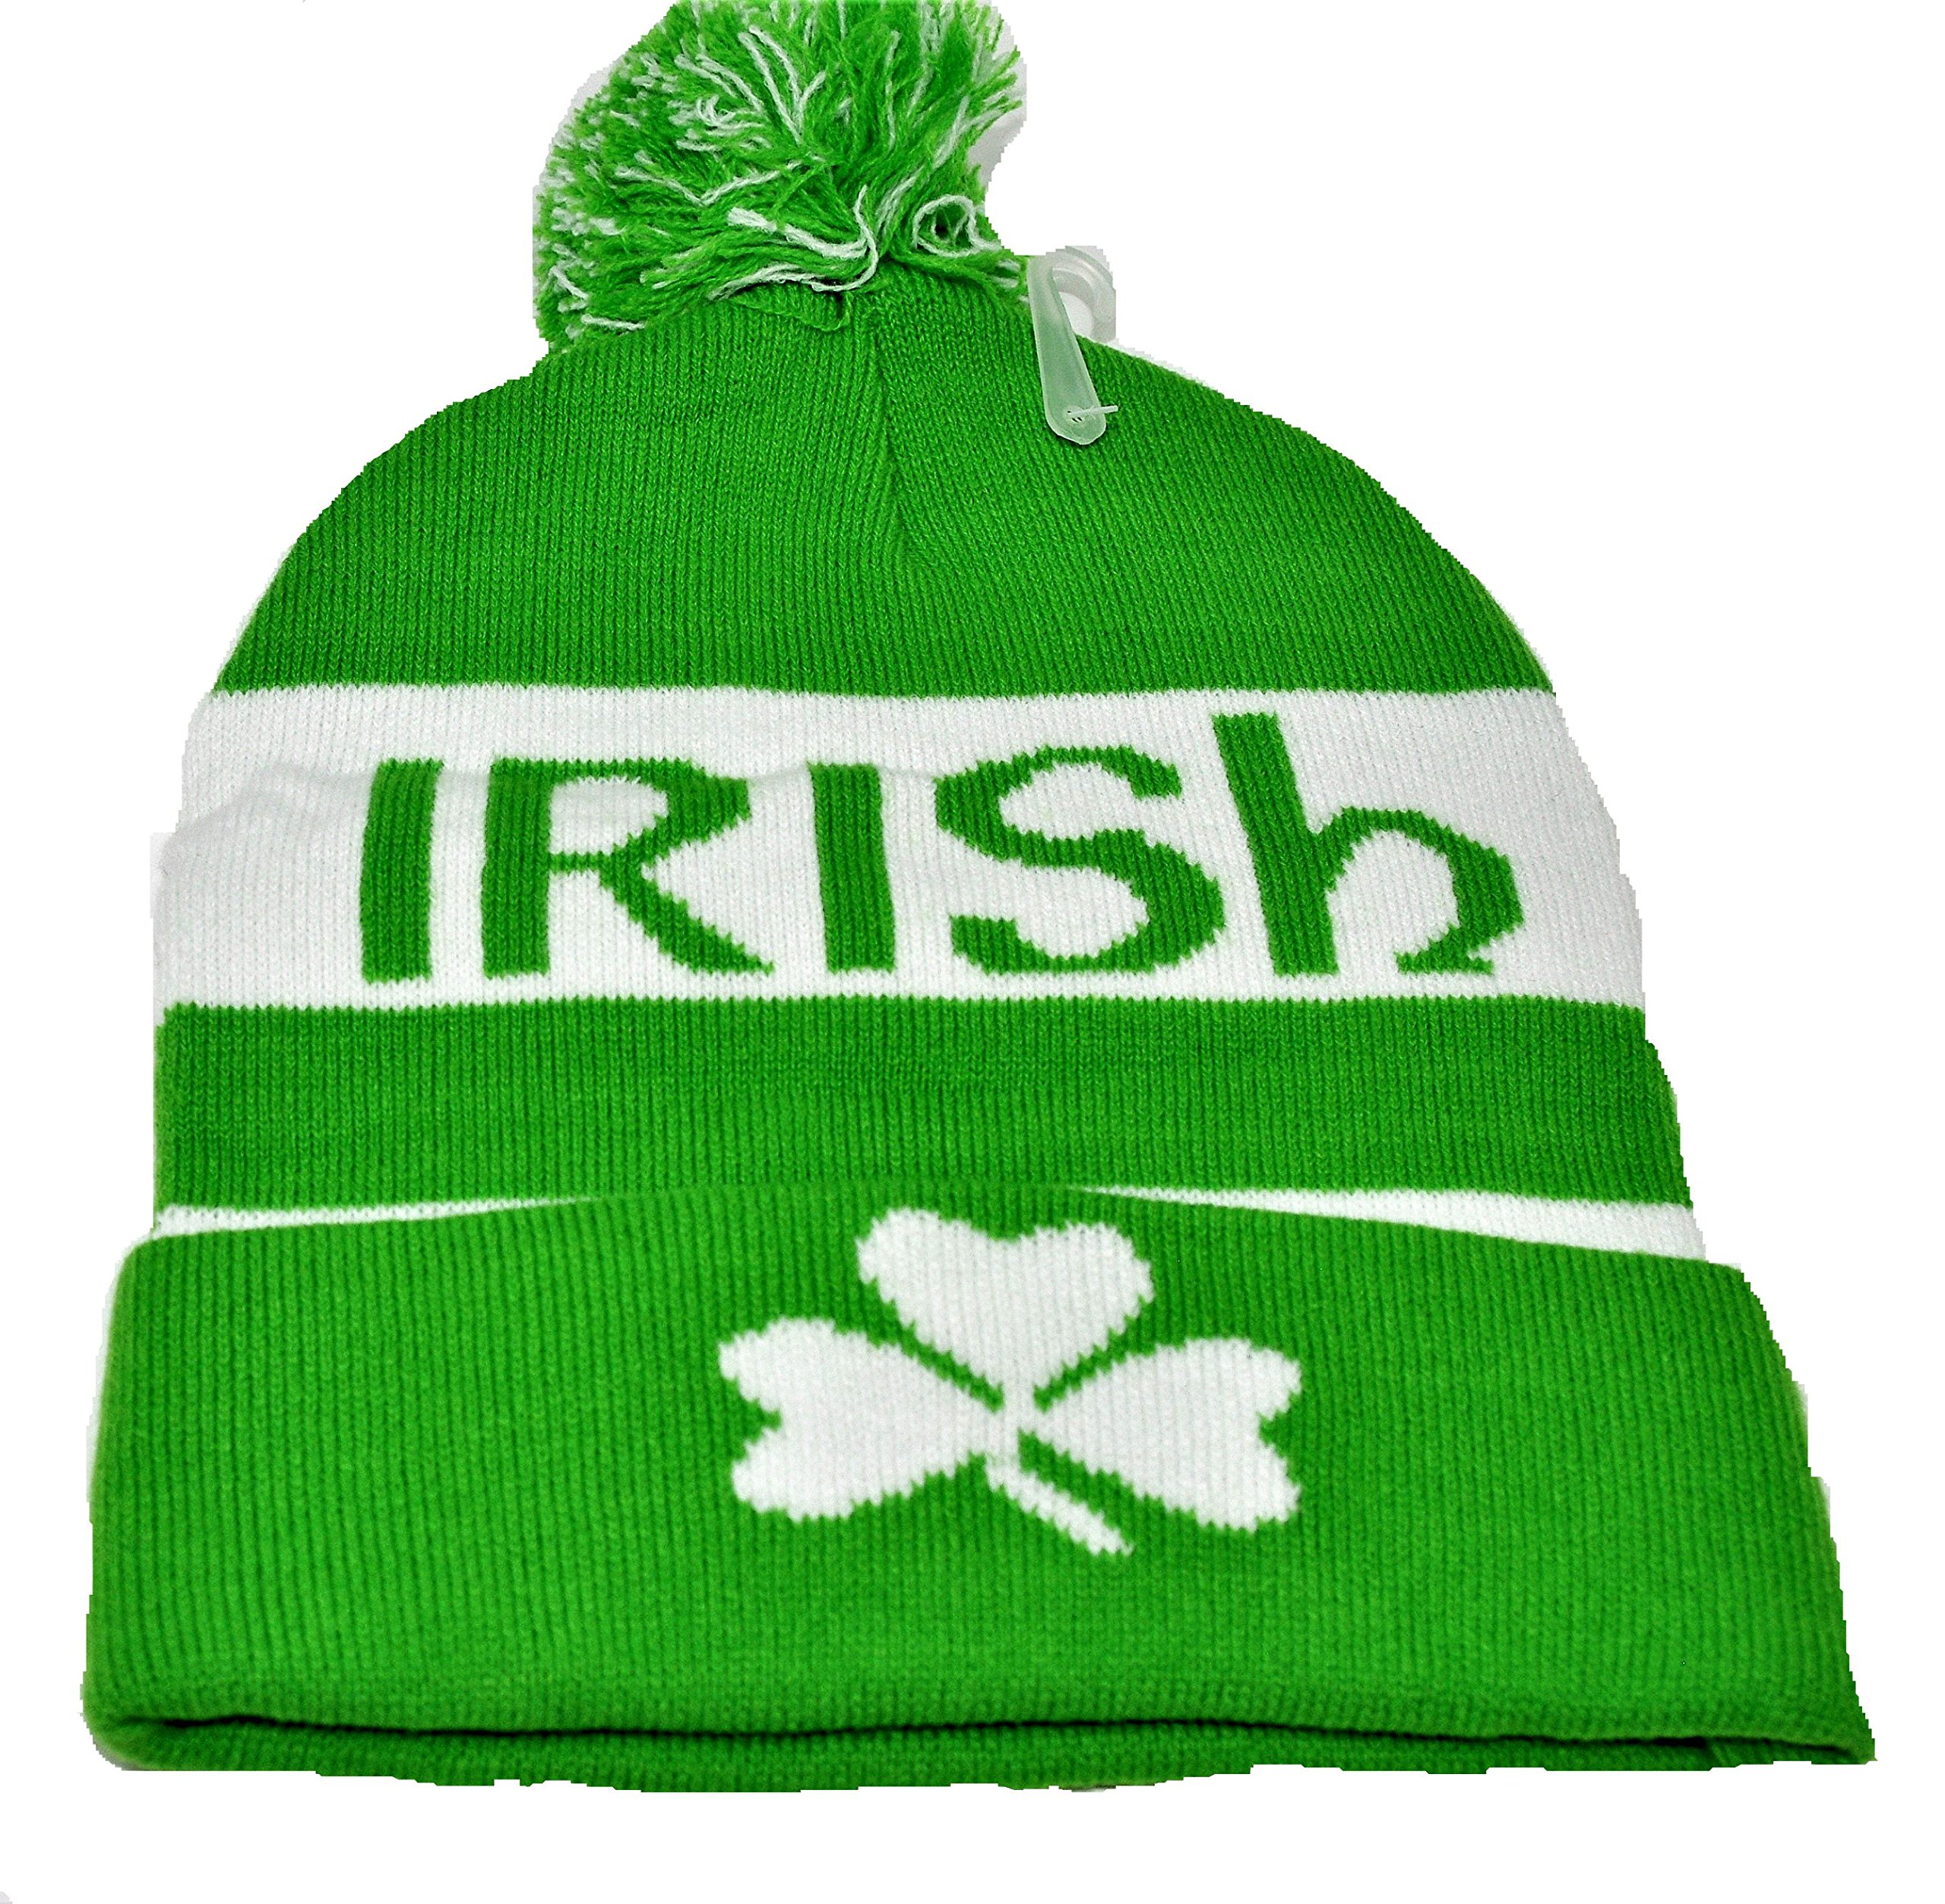 2d1f2f31899853 Vagabond Joes Green White Irish Clover Tassel Pom Knit Beanie ...